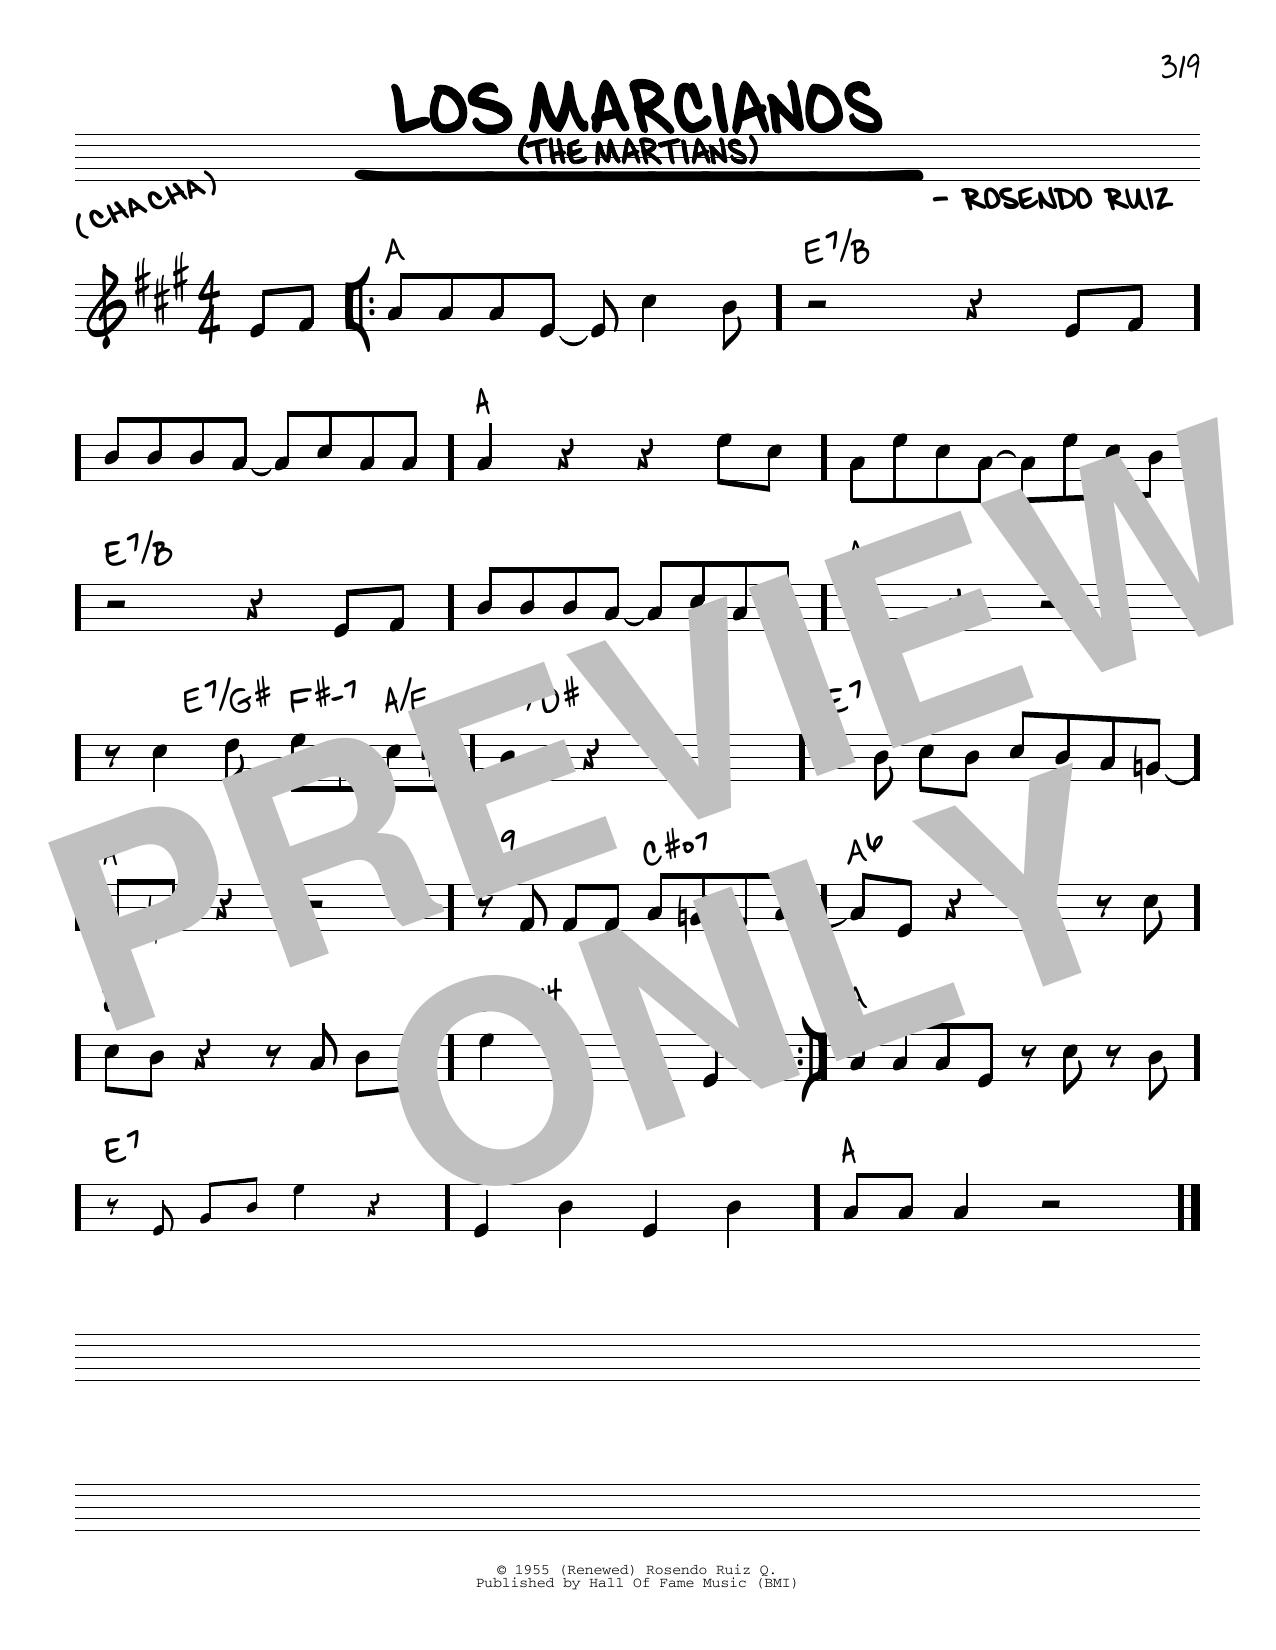 Rosendo Ruiz Los Marcianos (The Martians) sheet music notes and chords. Download Printable PDF.